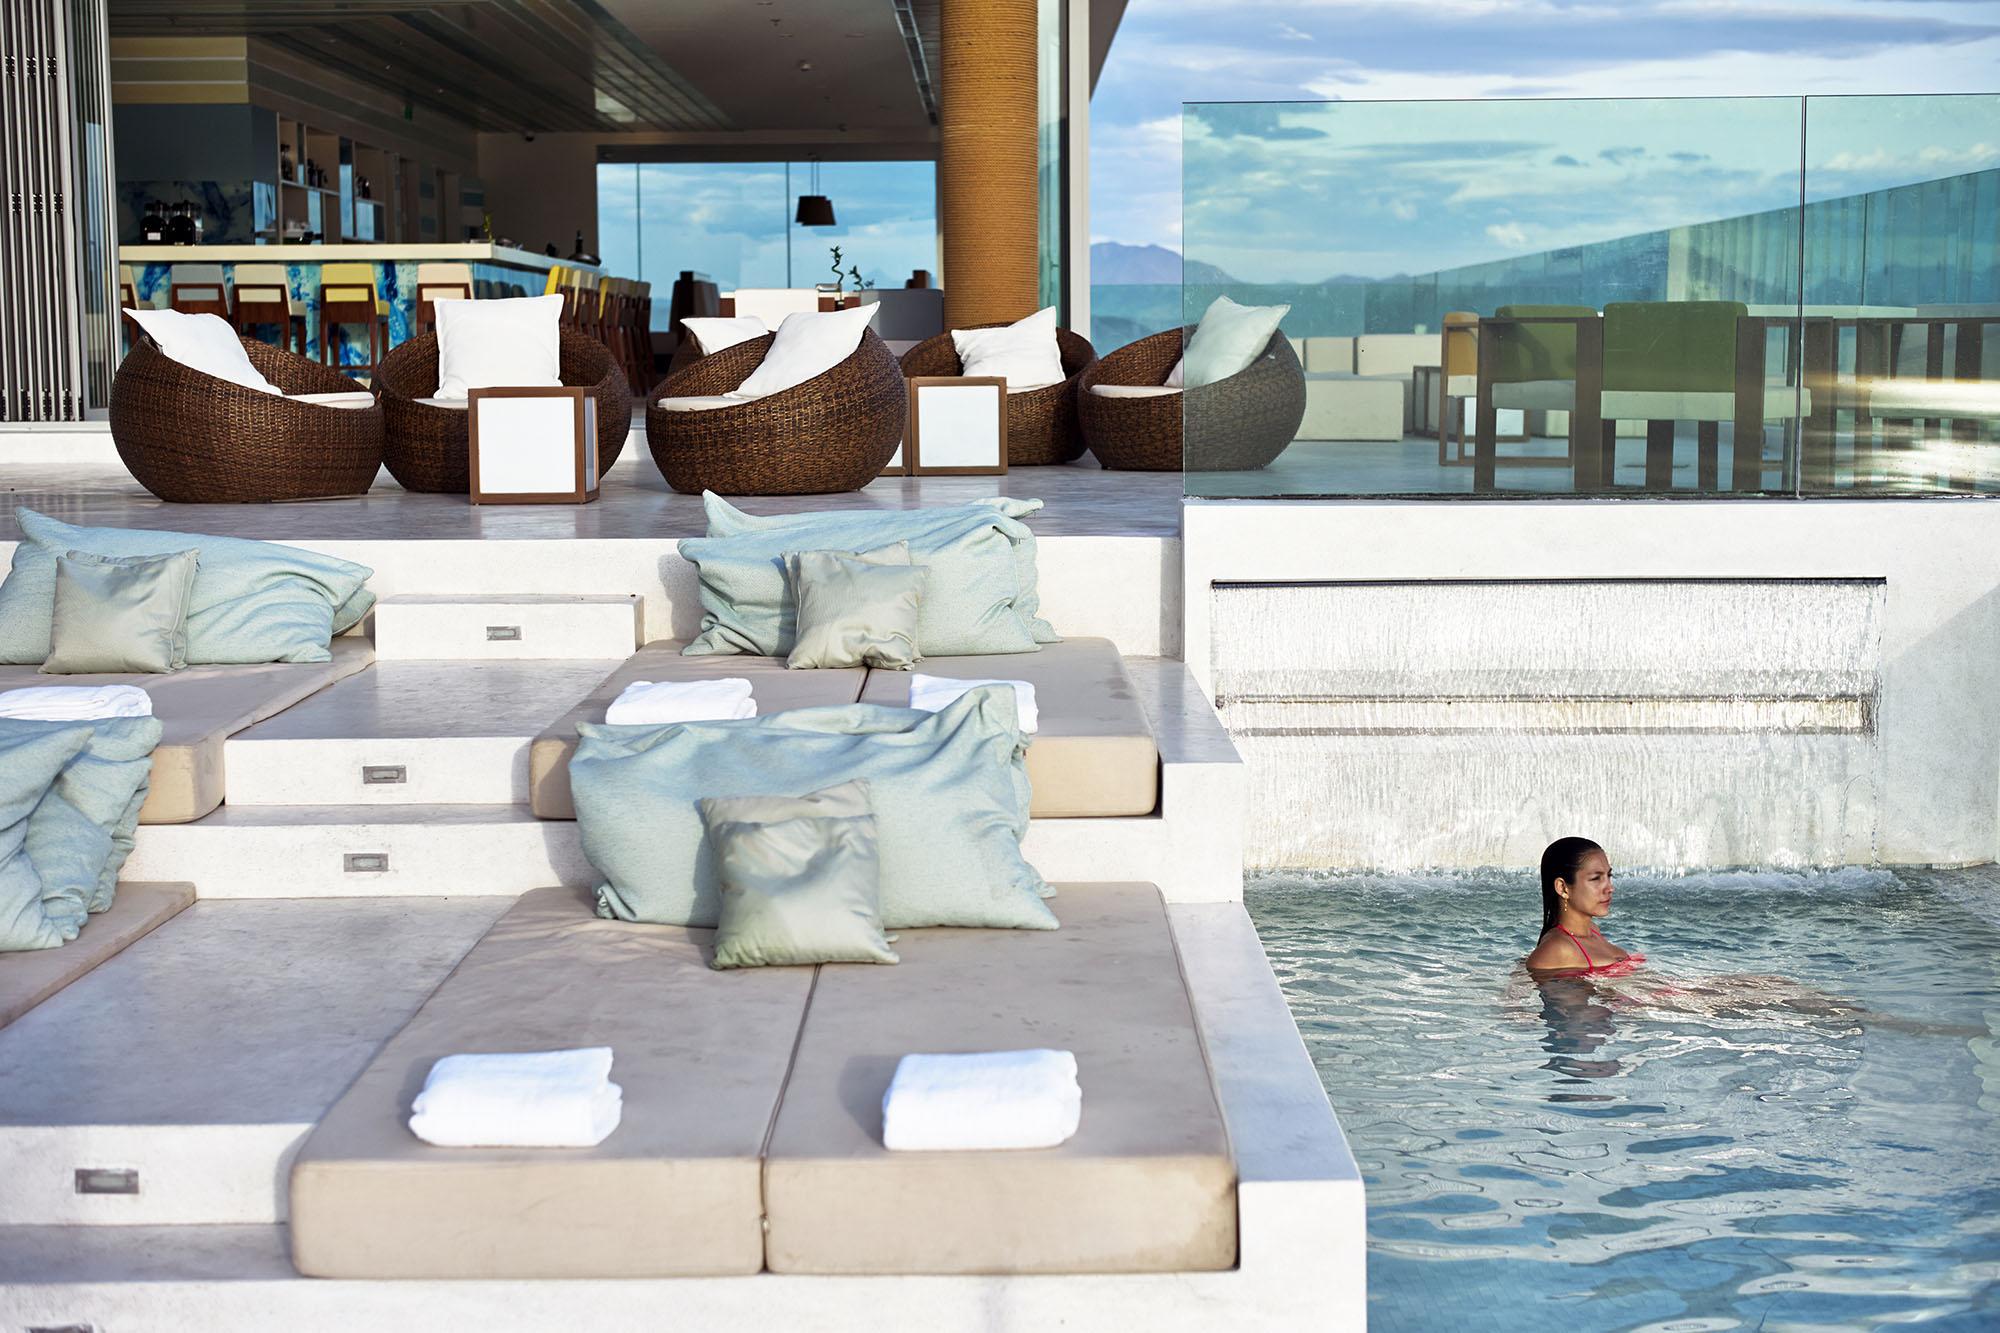 The Top Bar A La Carte Danang Beach Hotel 200 Vo Nguyen Giap Danang Fantasticity Com 04